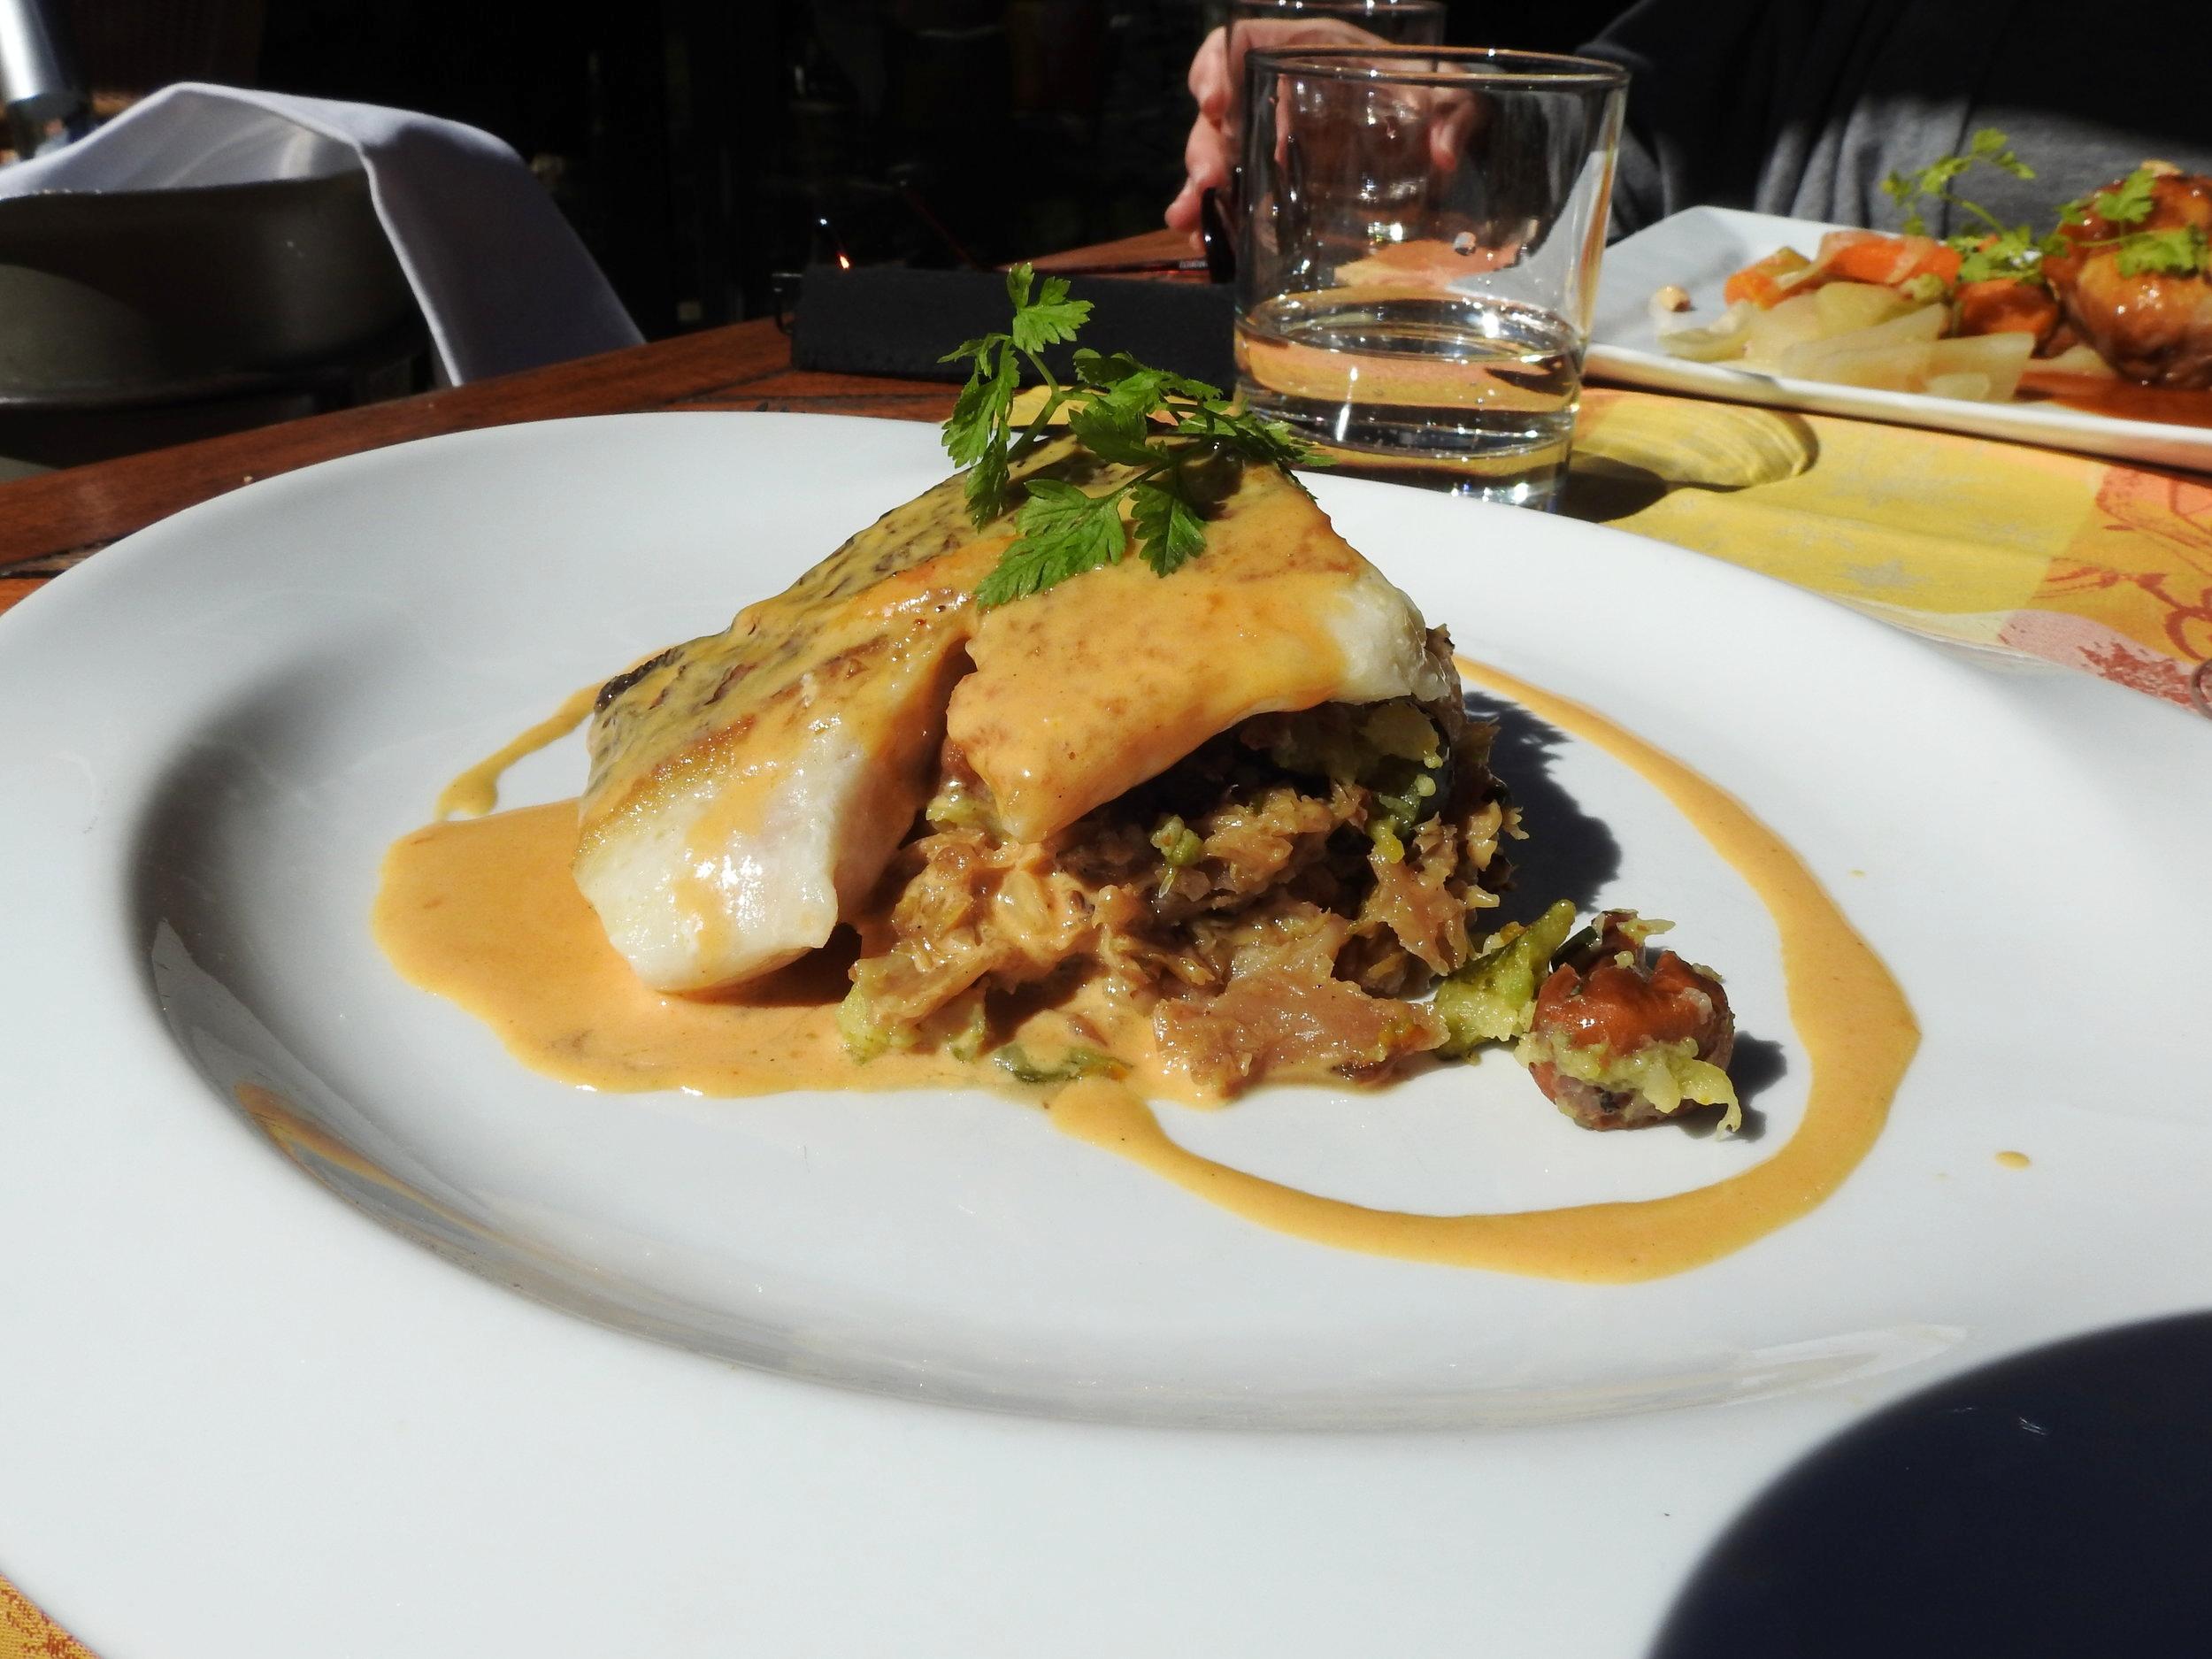 Enjoy a three-course gourmet lunch at L'estellan